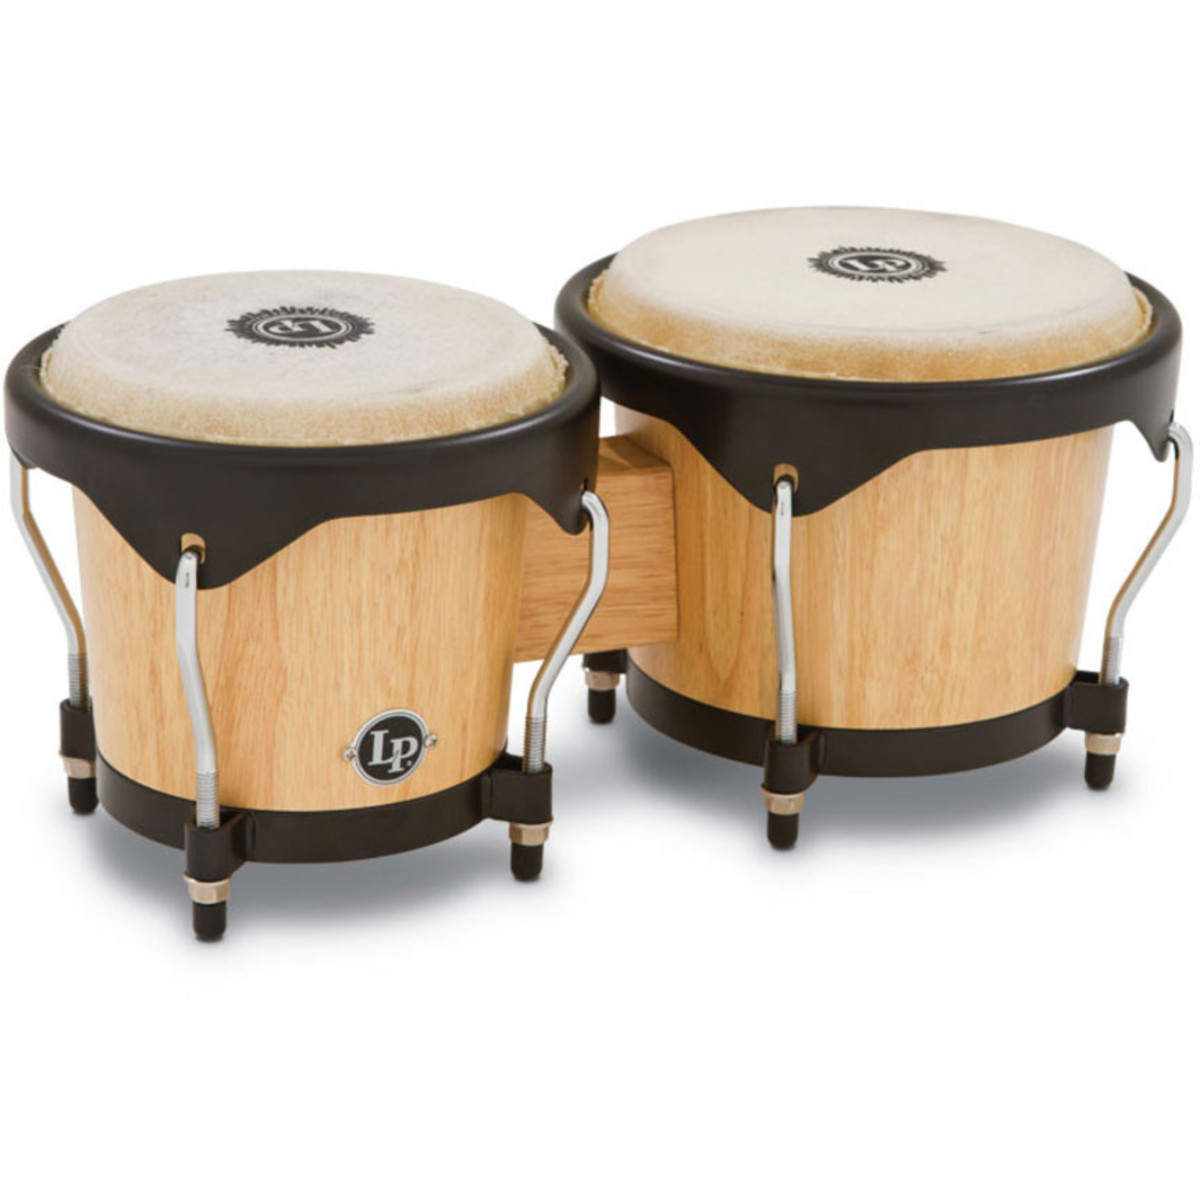 Lp wood bongos natural at gear music